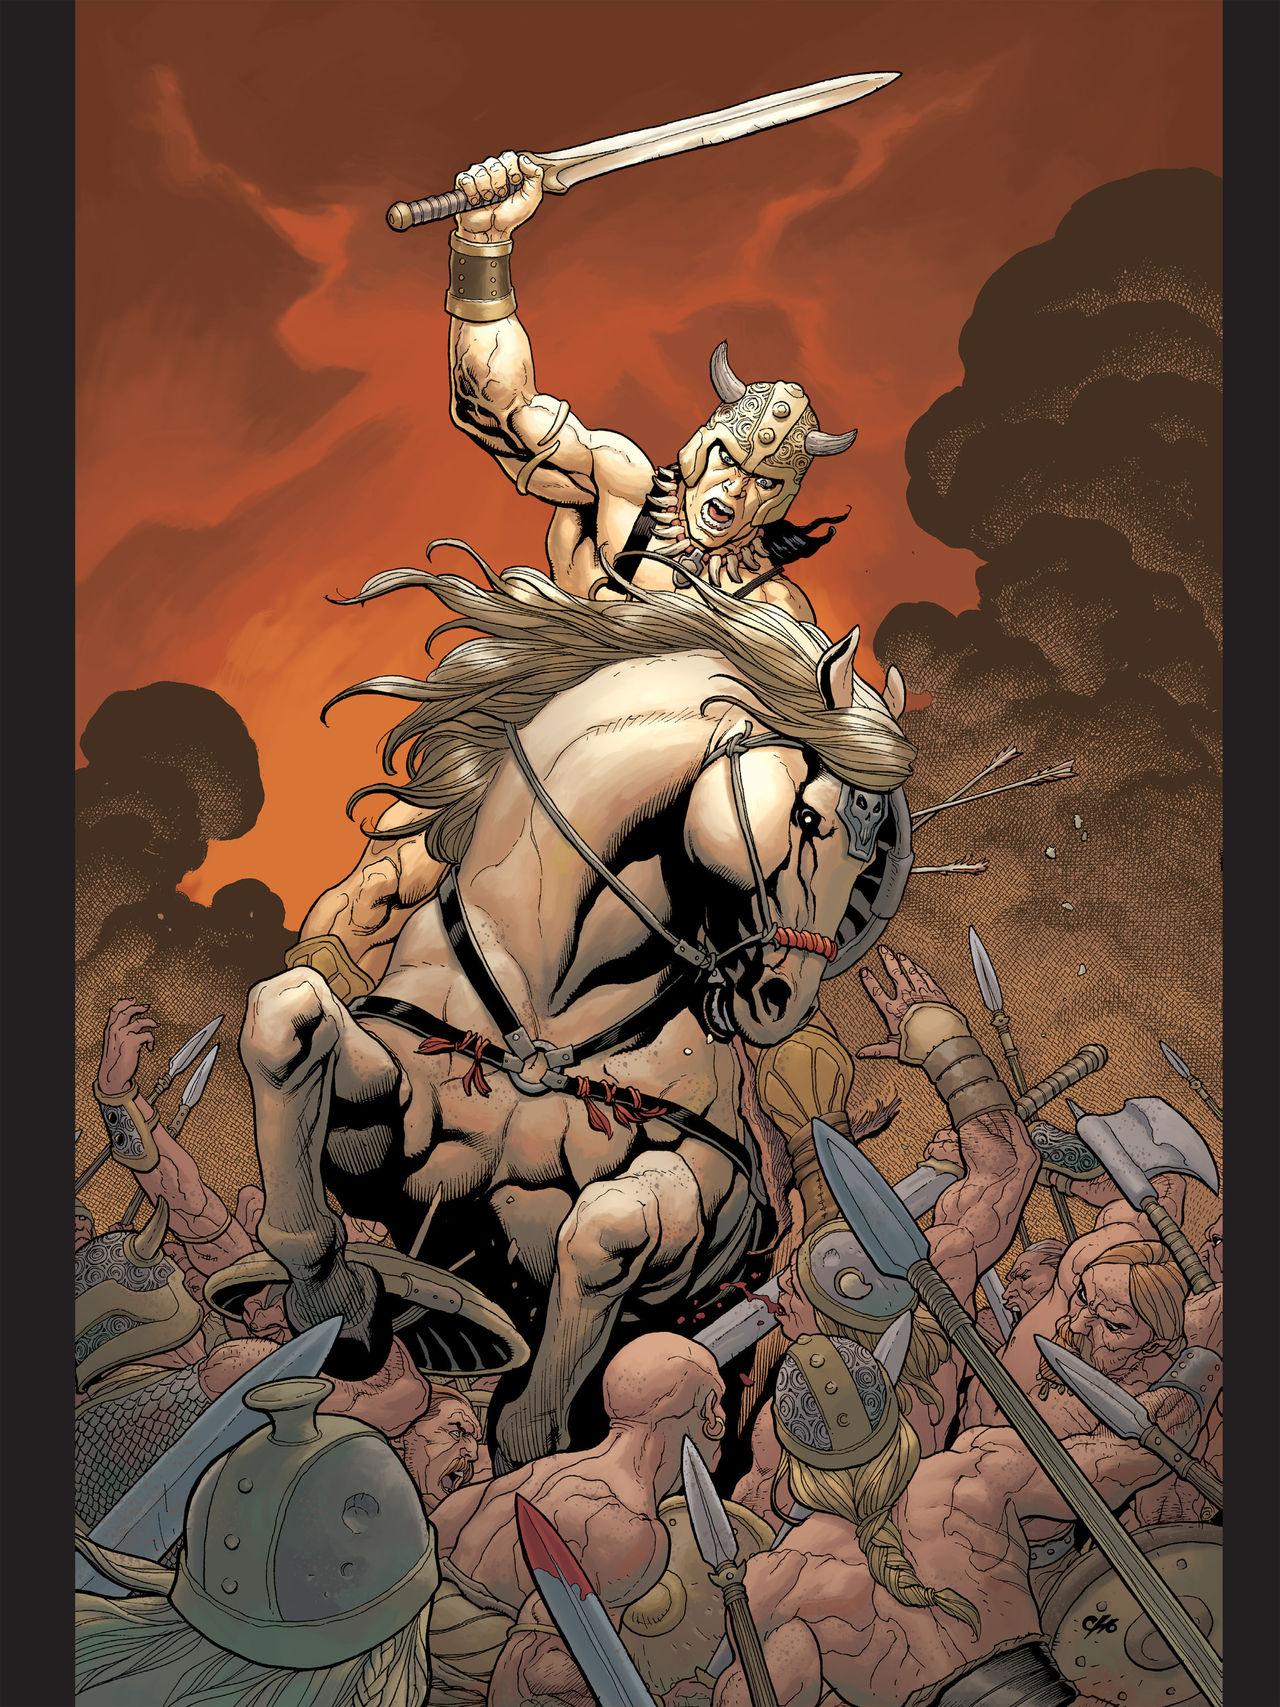 Conan (Conan the Barbarian) is a powerful barbarian who possesses brawn as  well as brain